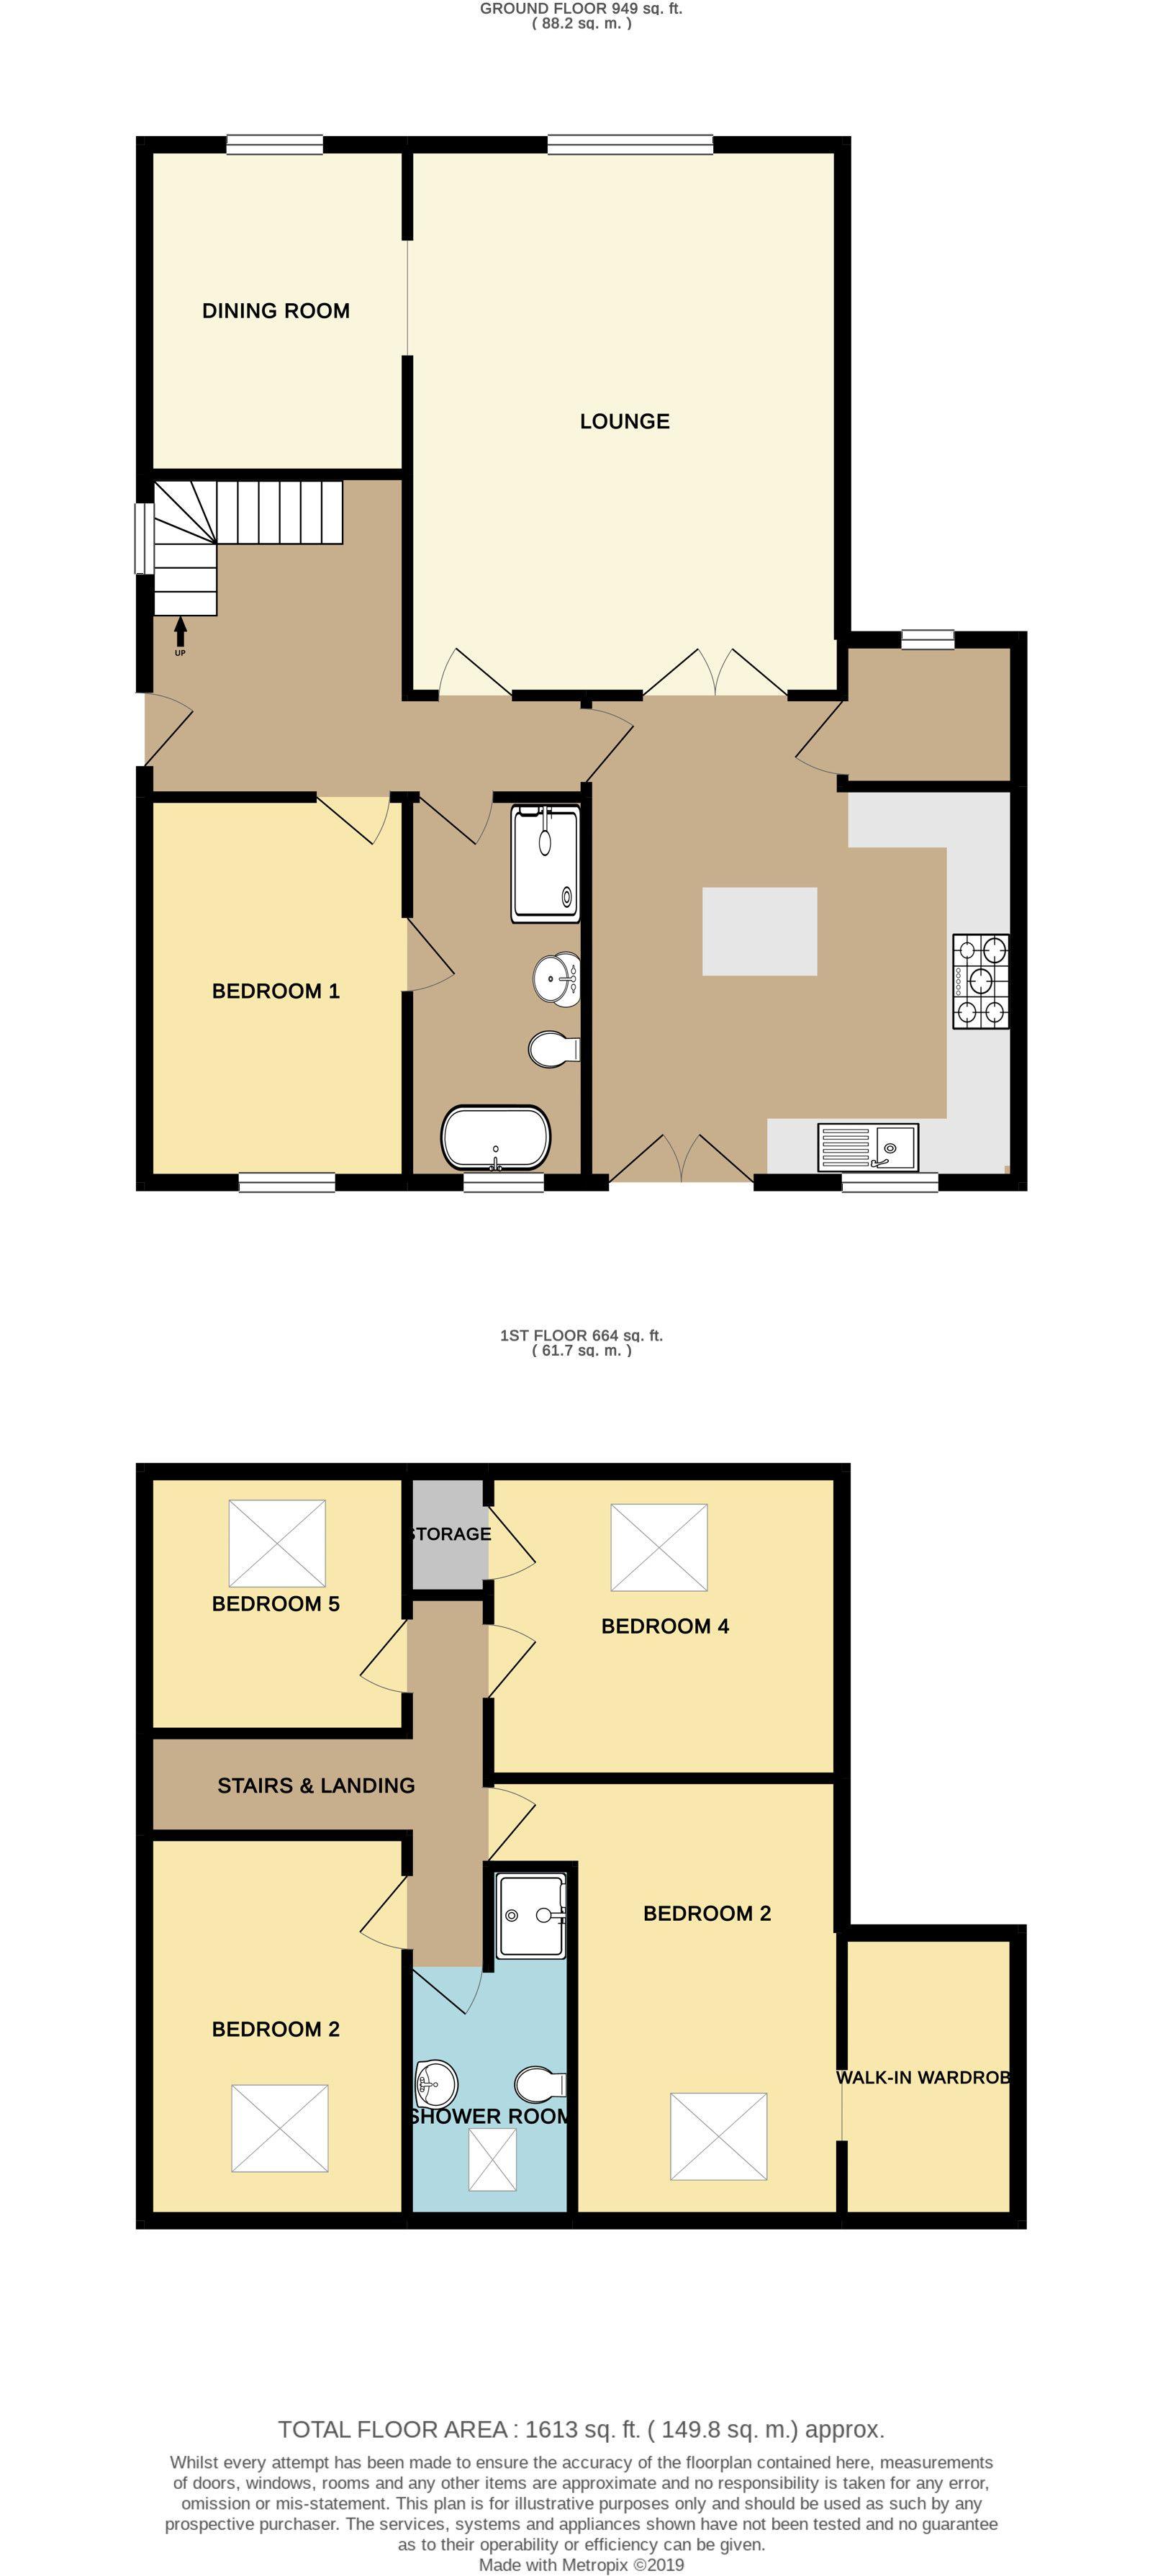 5 bedroom detached house SSTC in Brighouse - Floorplan 1